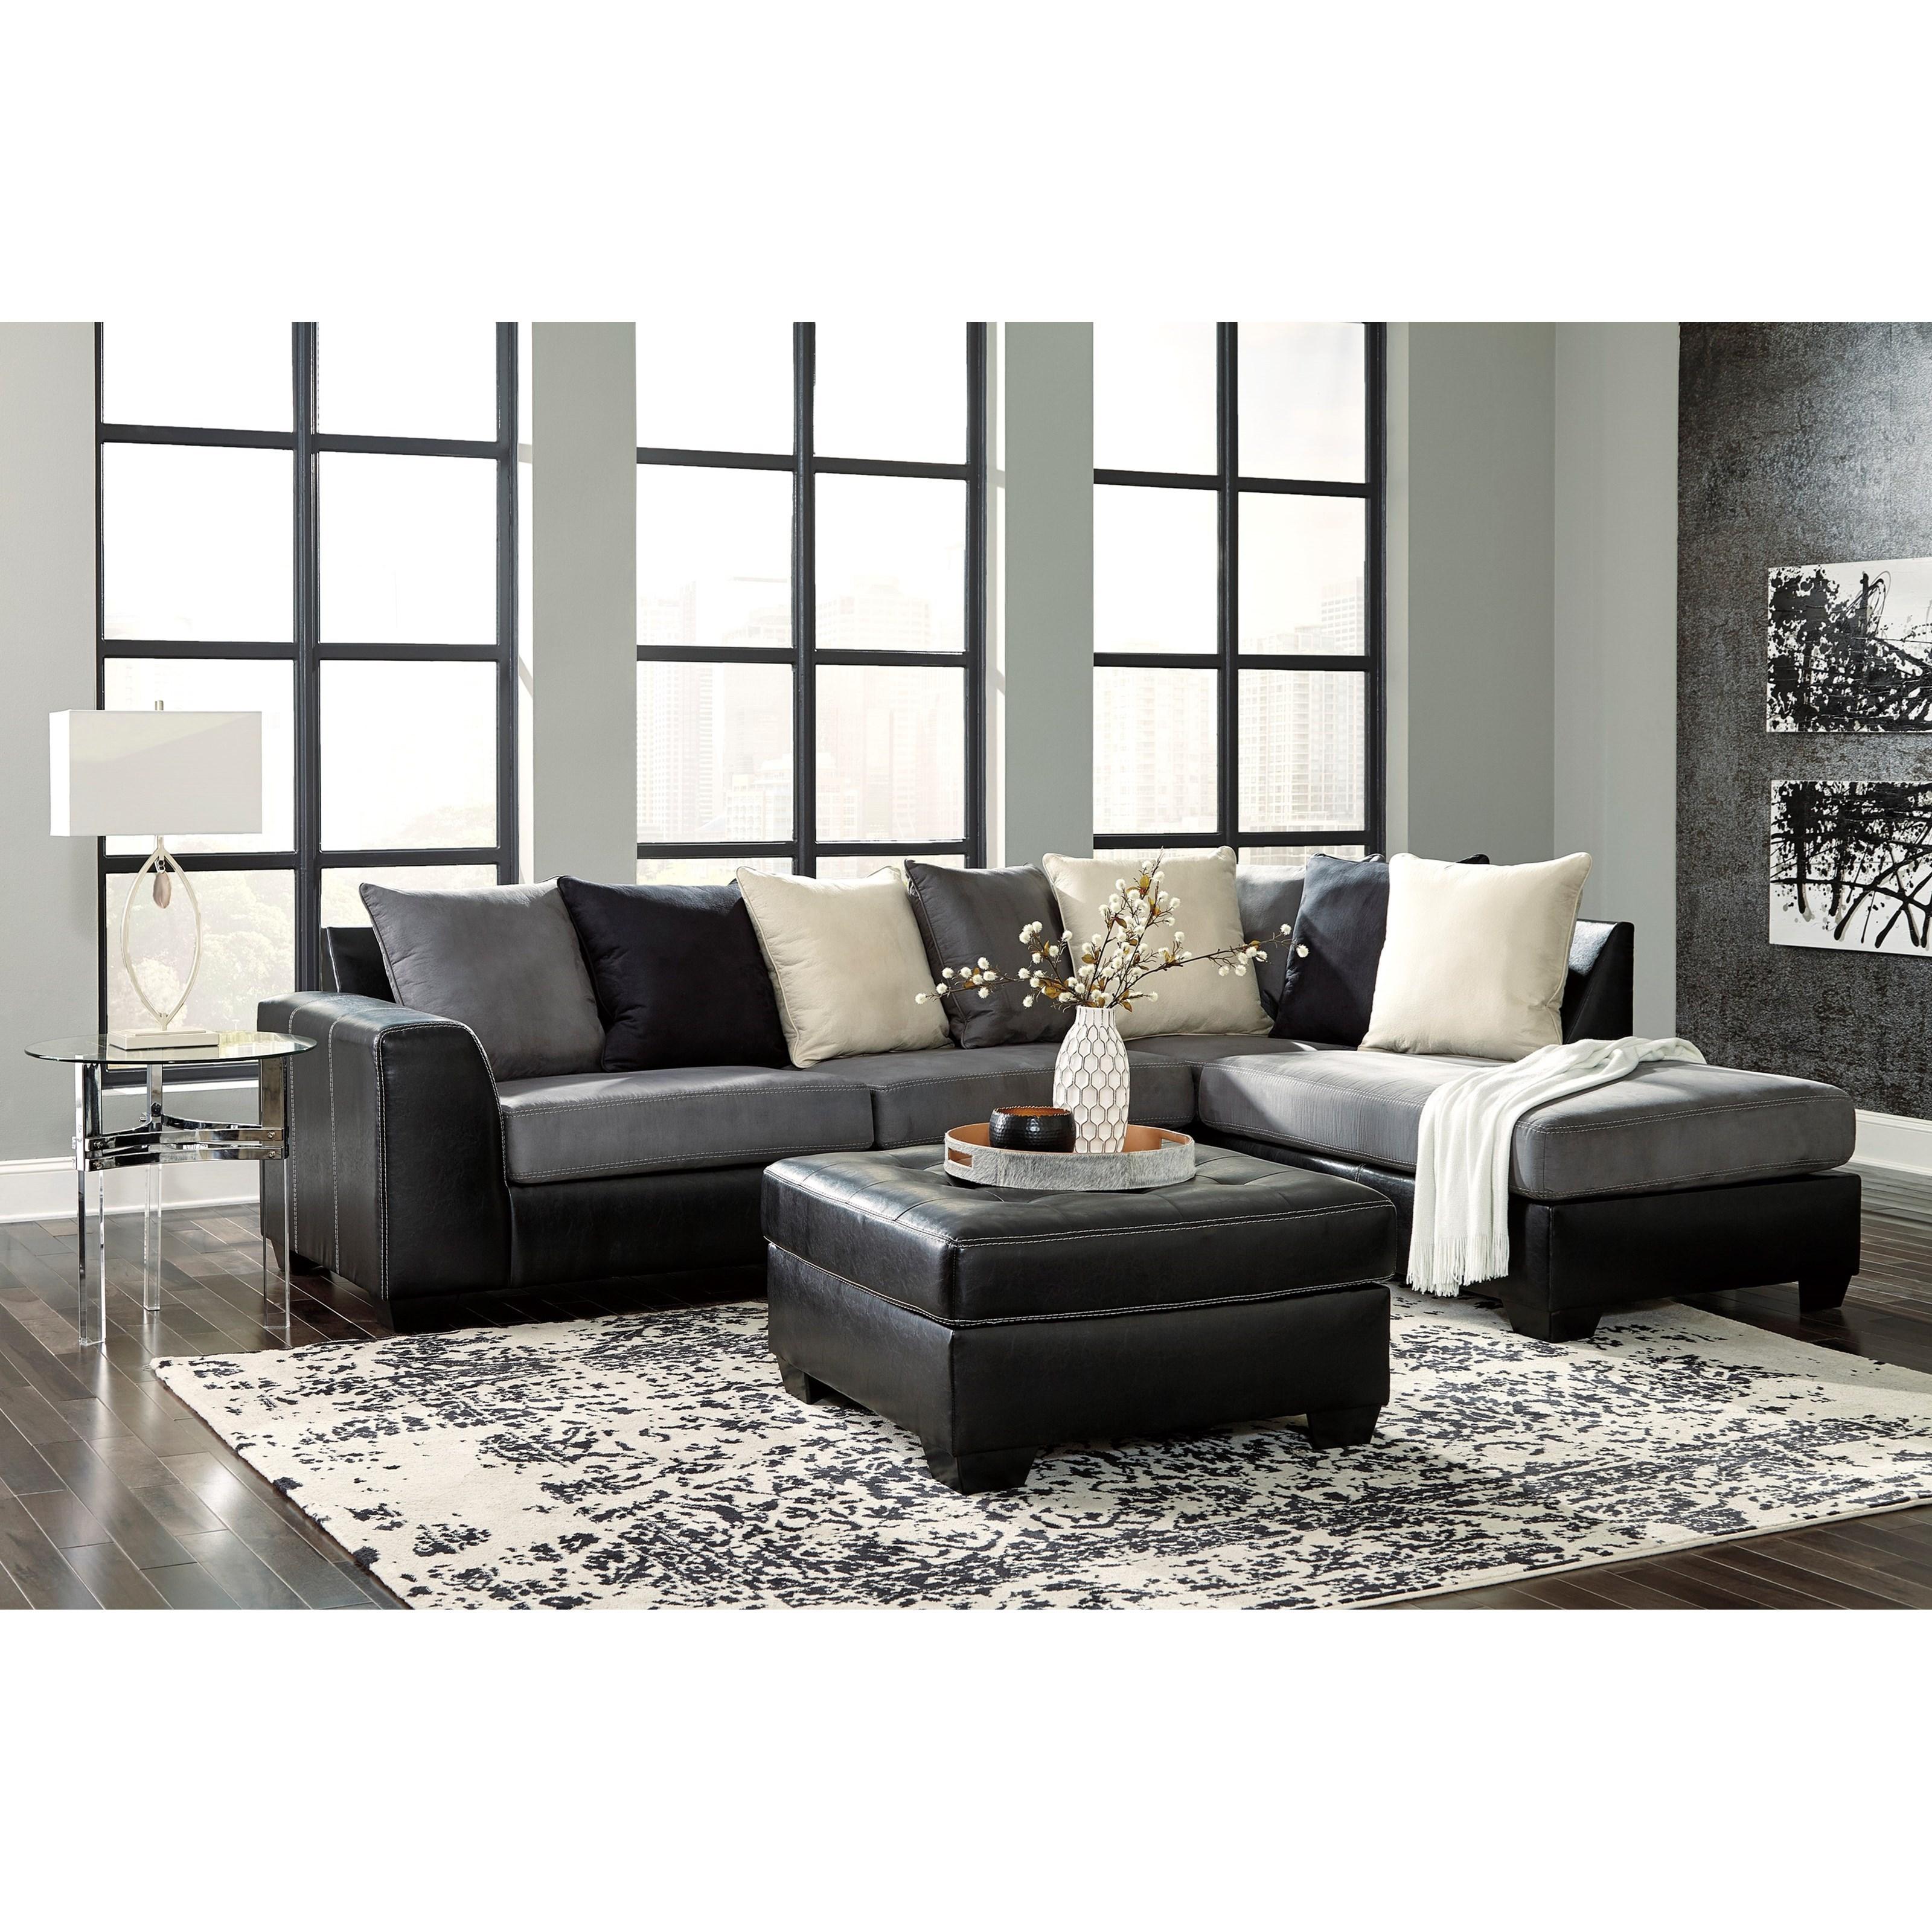 Jacurso Stationary Living Room Group by Ashley (Signature Design) at Johnny Janosik